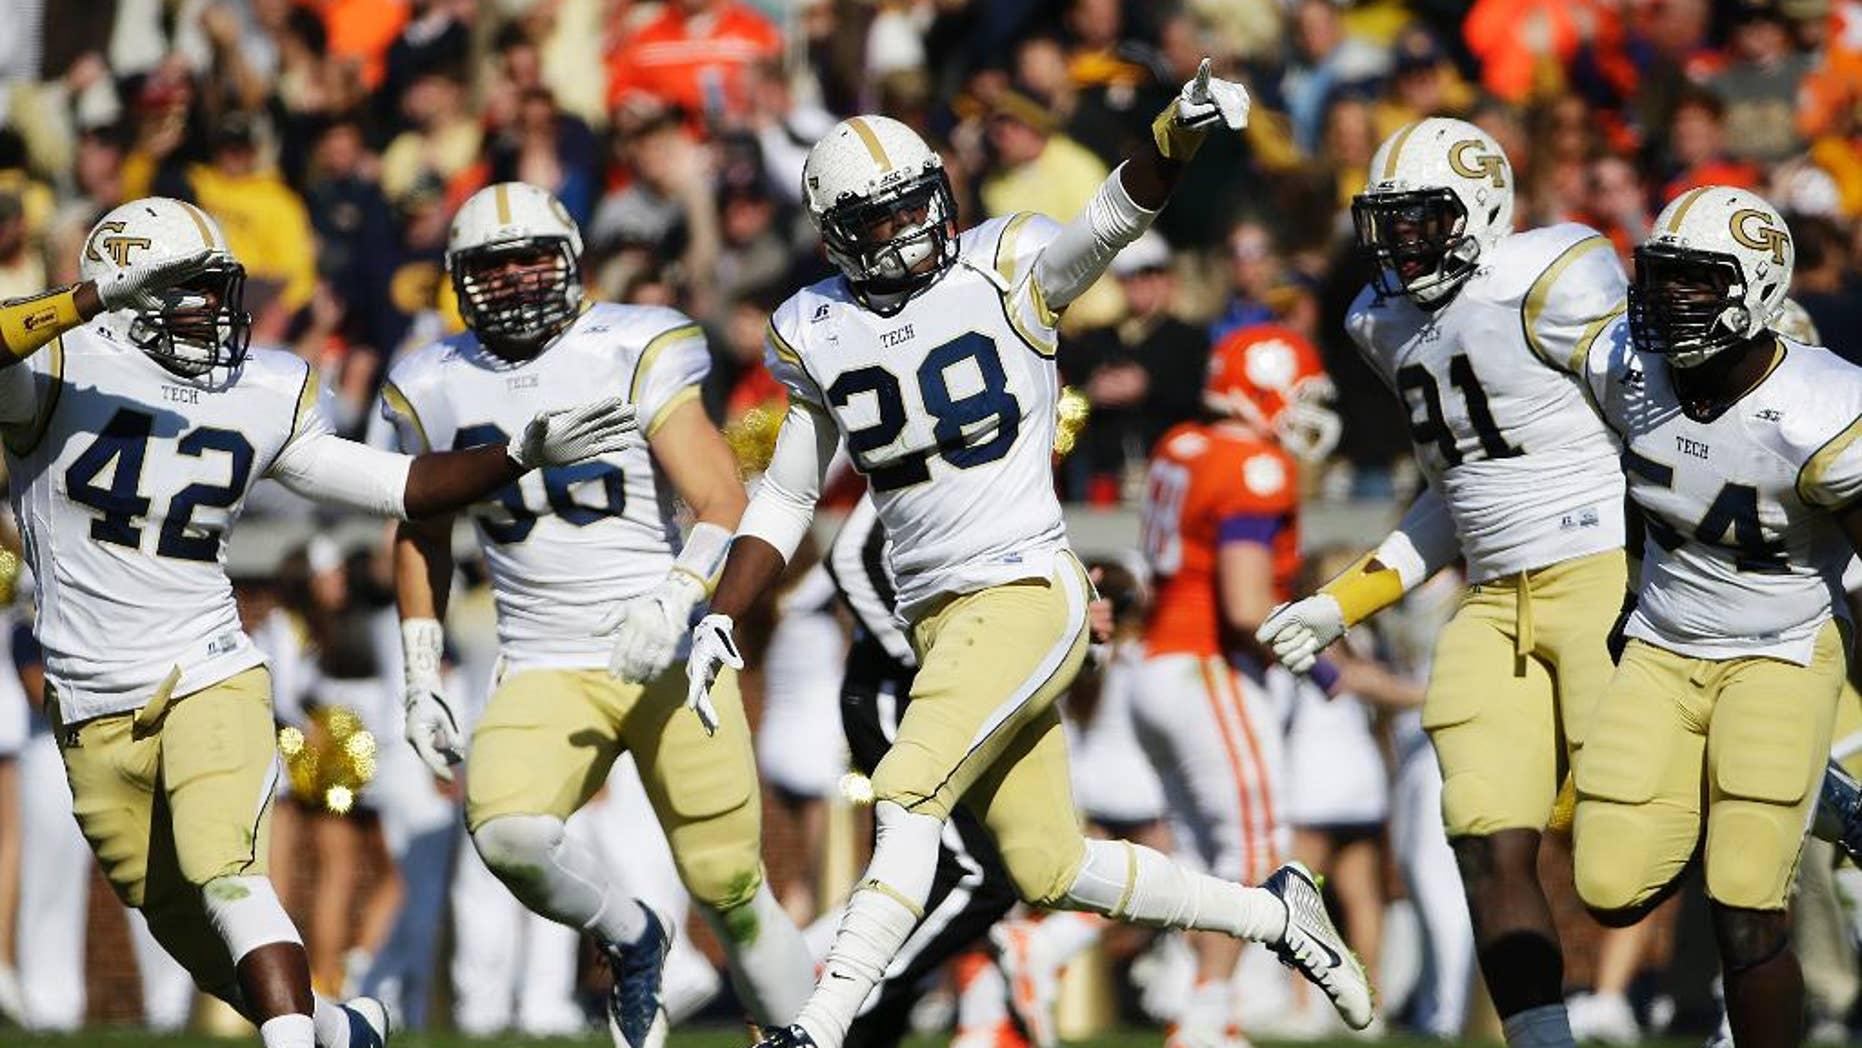 Georgia Tech's D.J. White, center, celebrates after intercepting a pass in the third quarter of an NCAA college football game against Clemson, Saturday, Nov. 15, 2014, in Atlanta. Georgia Tech won 28-6. (AP Photo/David Goldman)